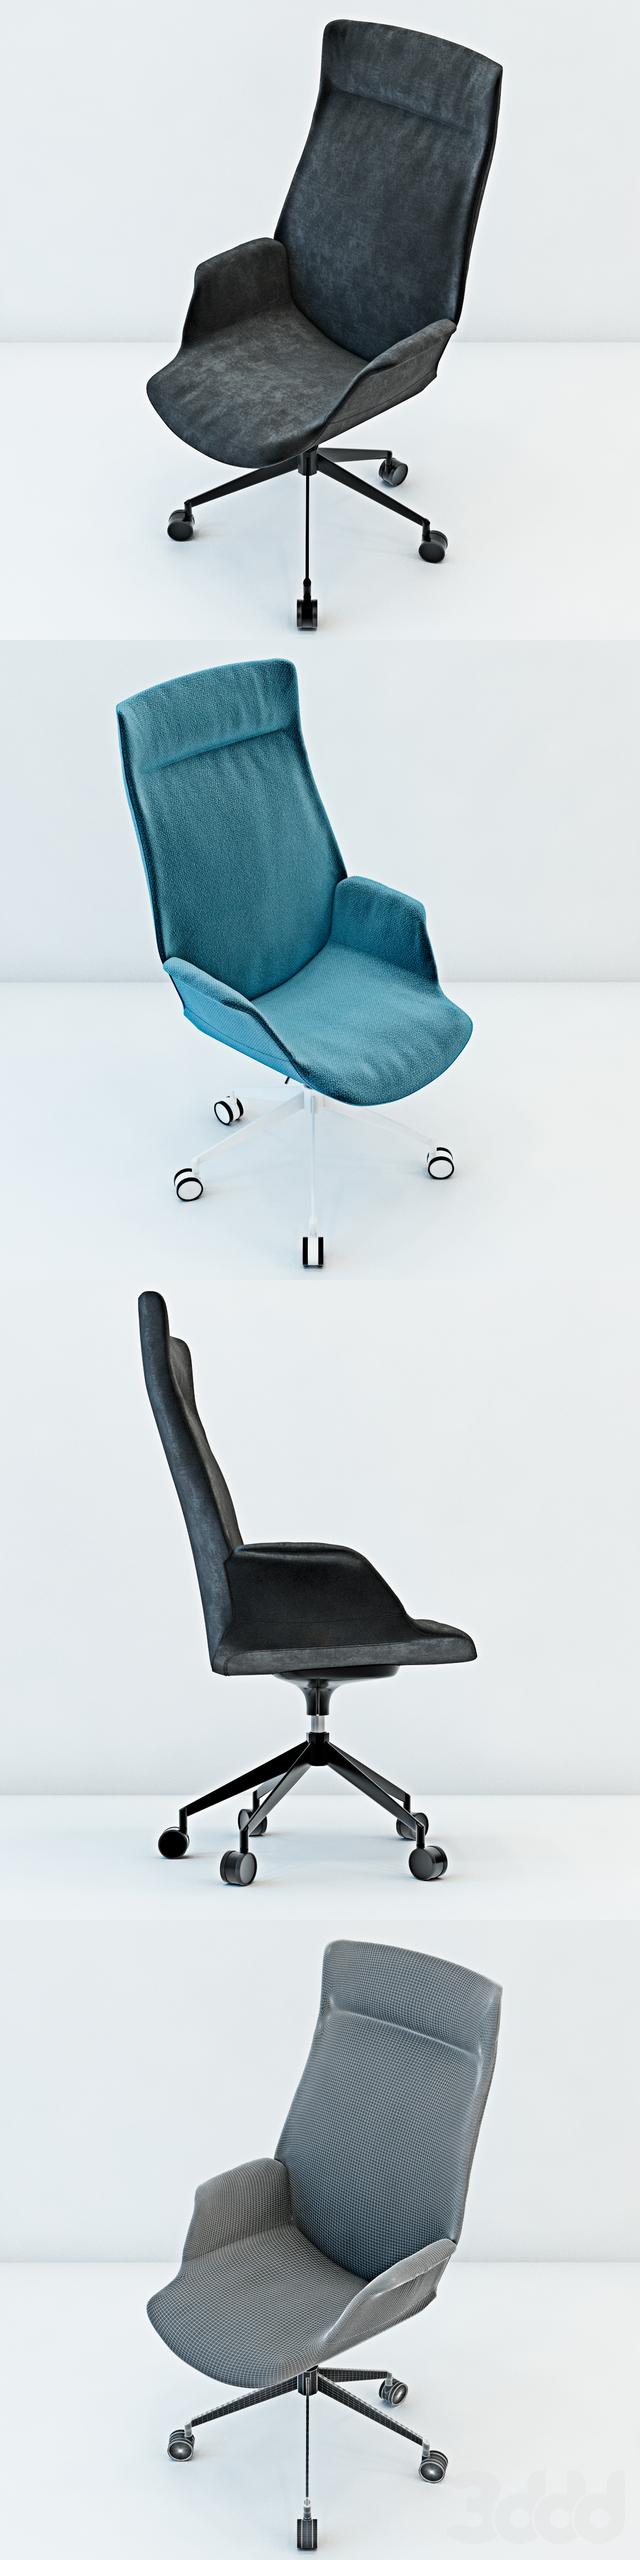 chartered accounta uno chair - 640×2560